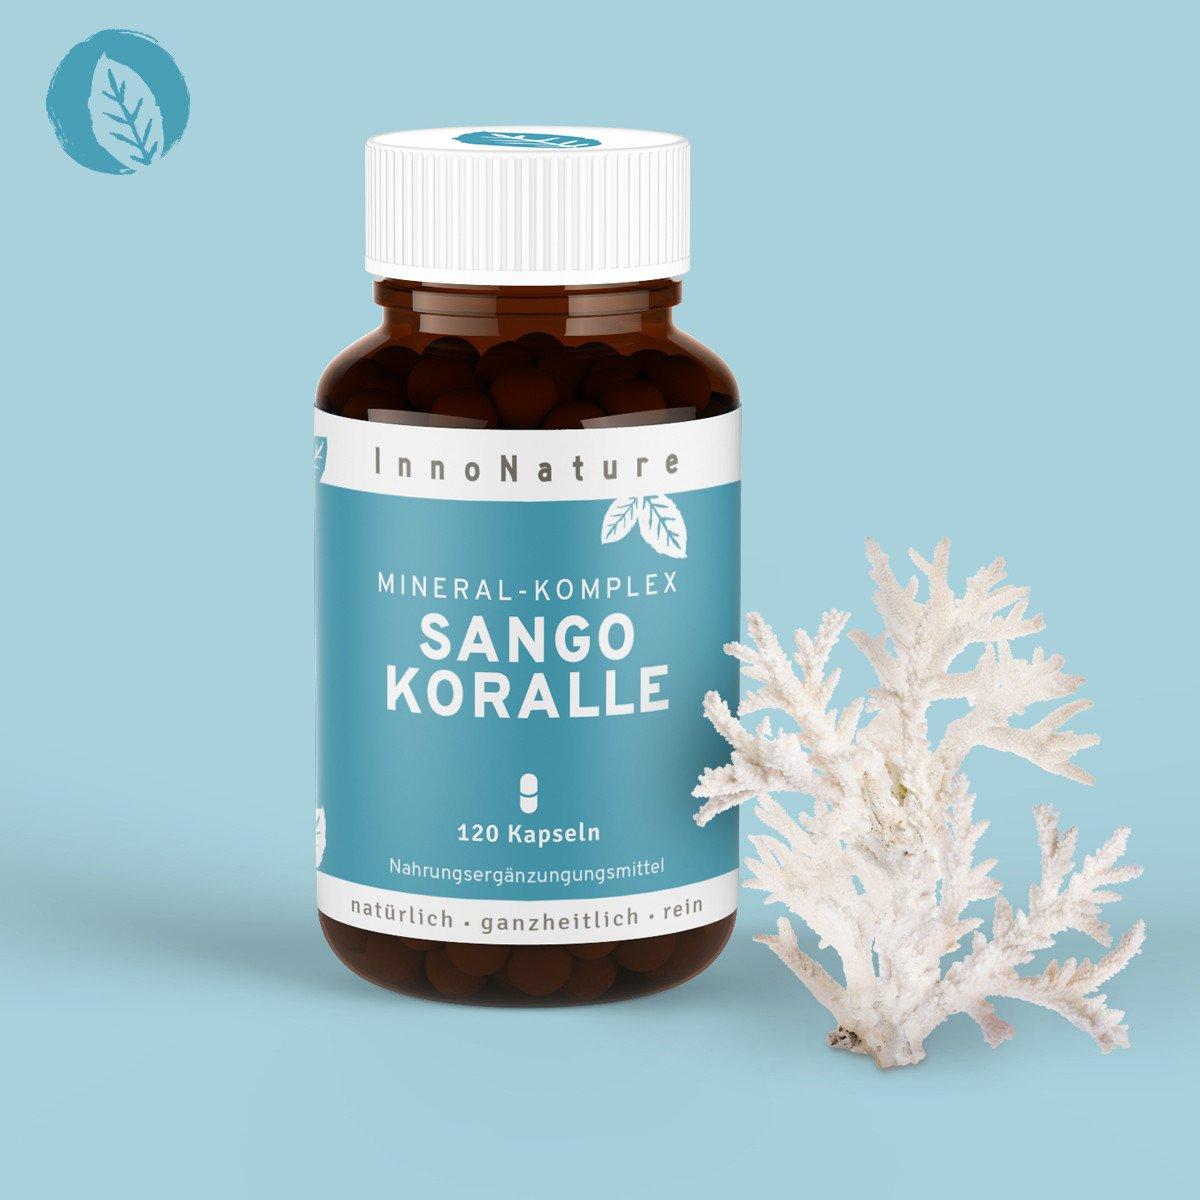 vegane Nahrungsergänzungsmittel - Sango Koralle InnoNature